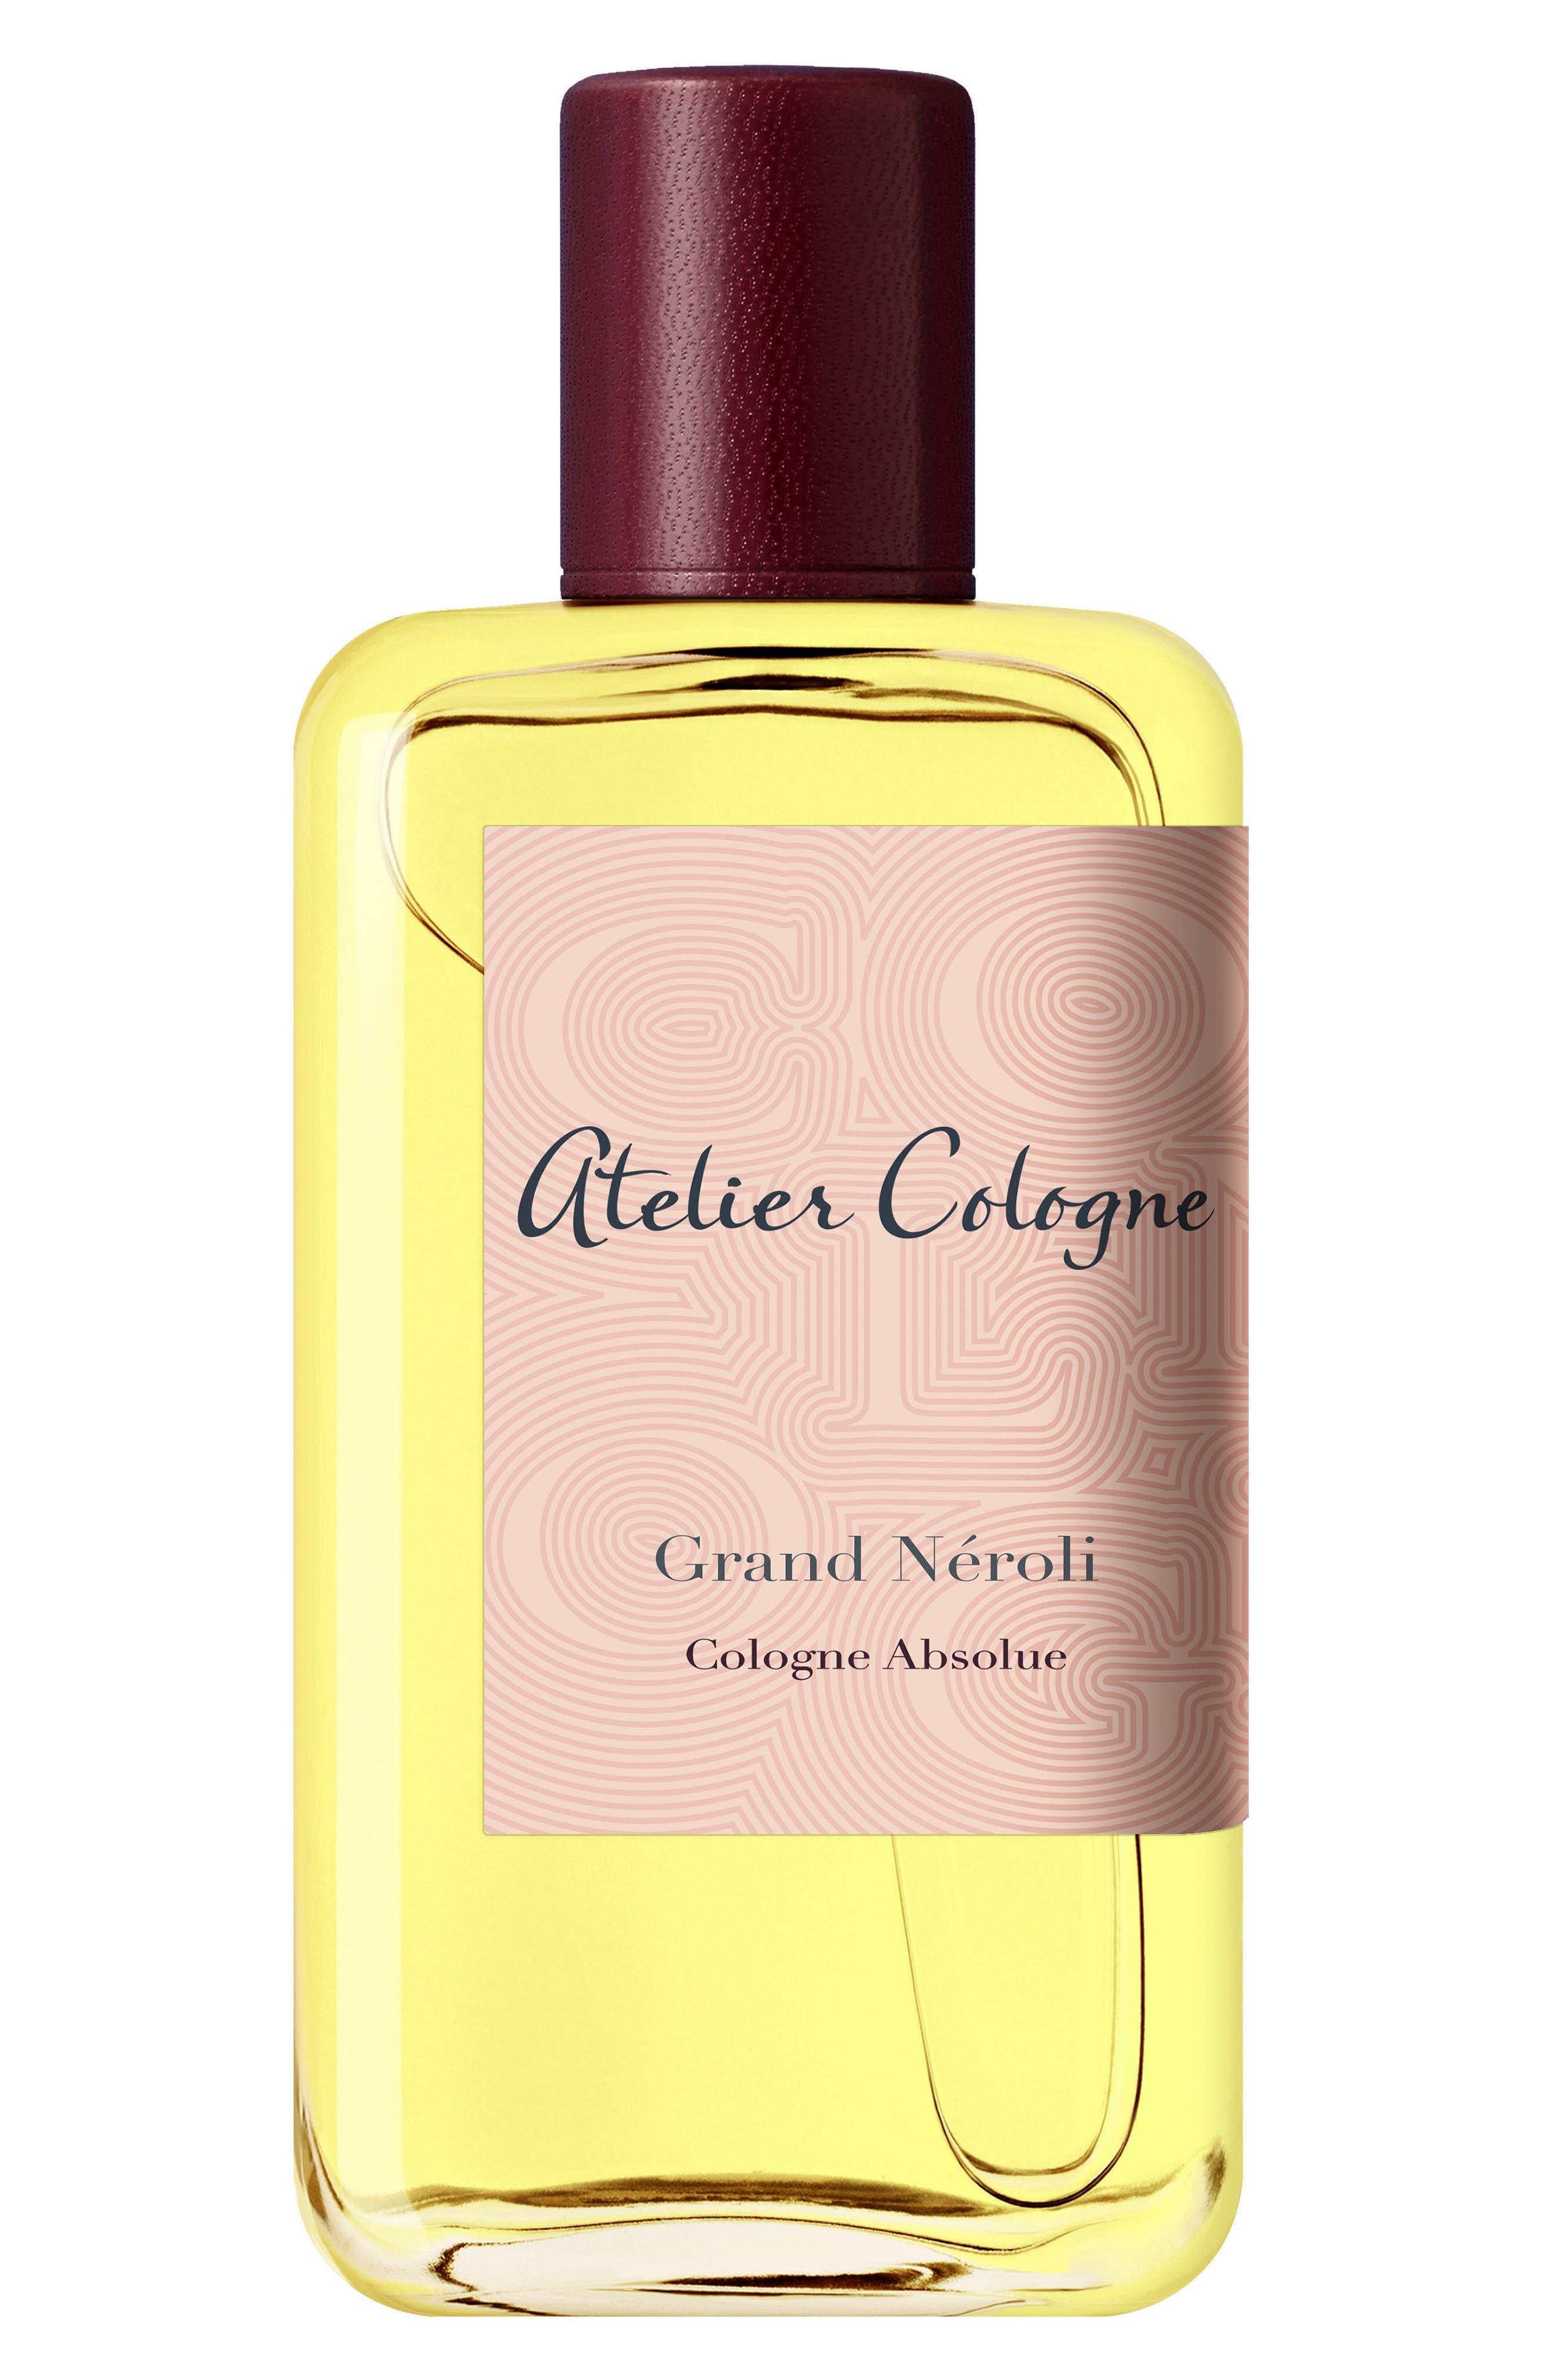 ATELIER COLOGNE, Grand Néroli Cologne Absolue, Alternate thumbnail 6, color, NO COLOR